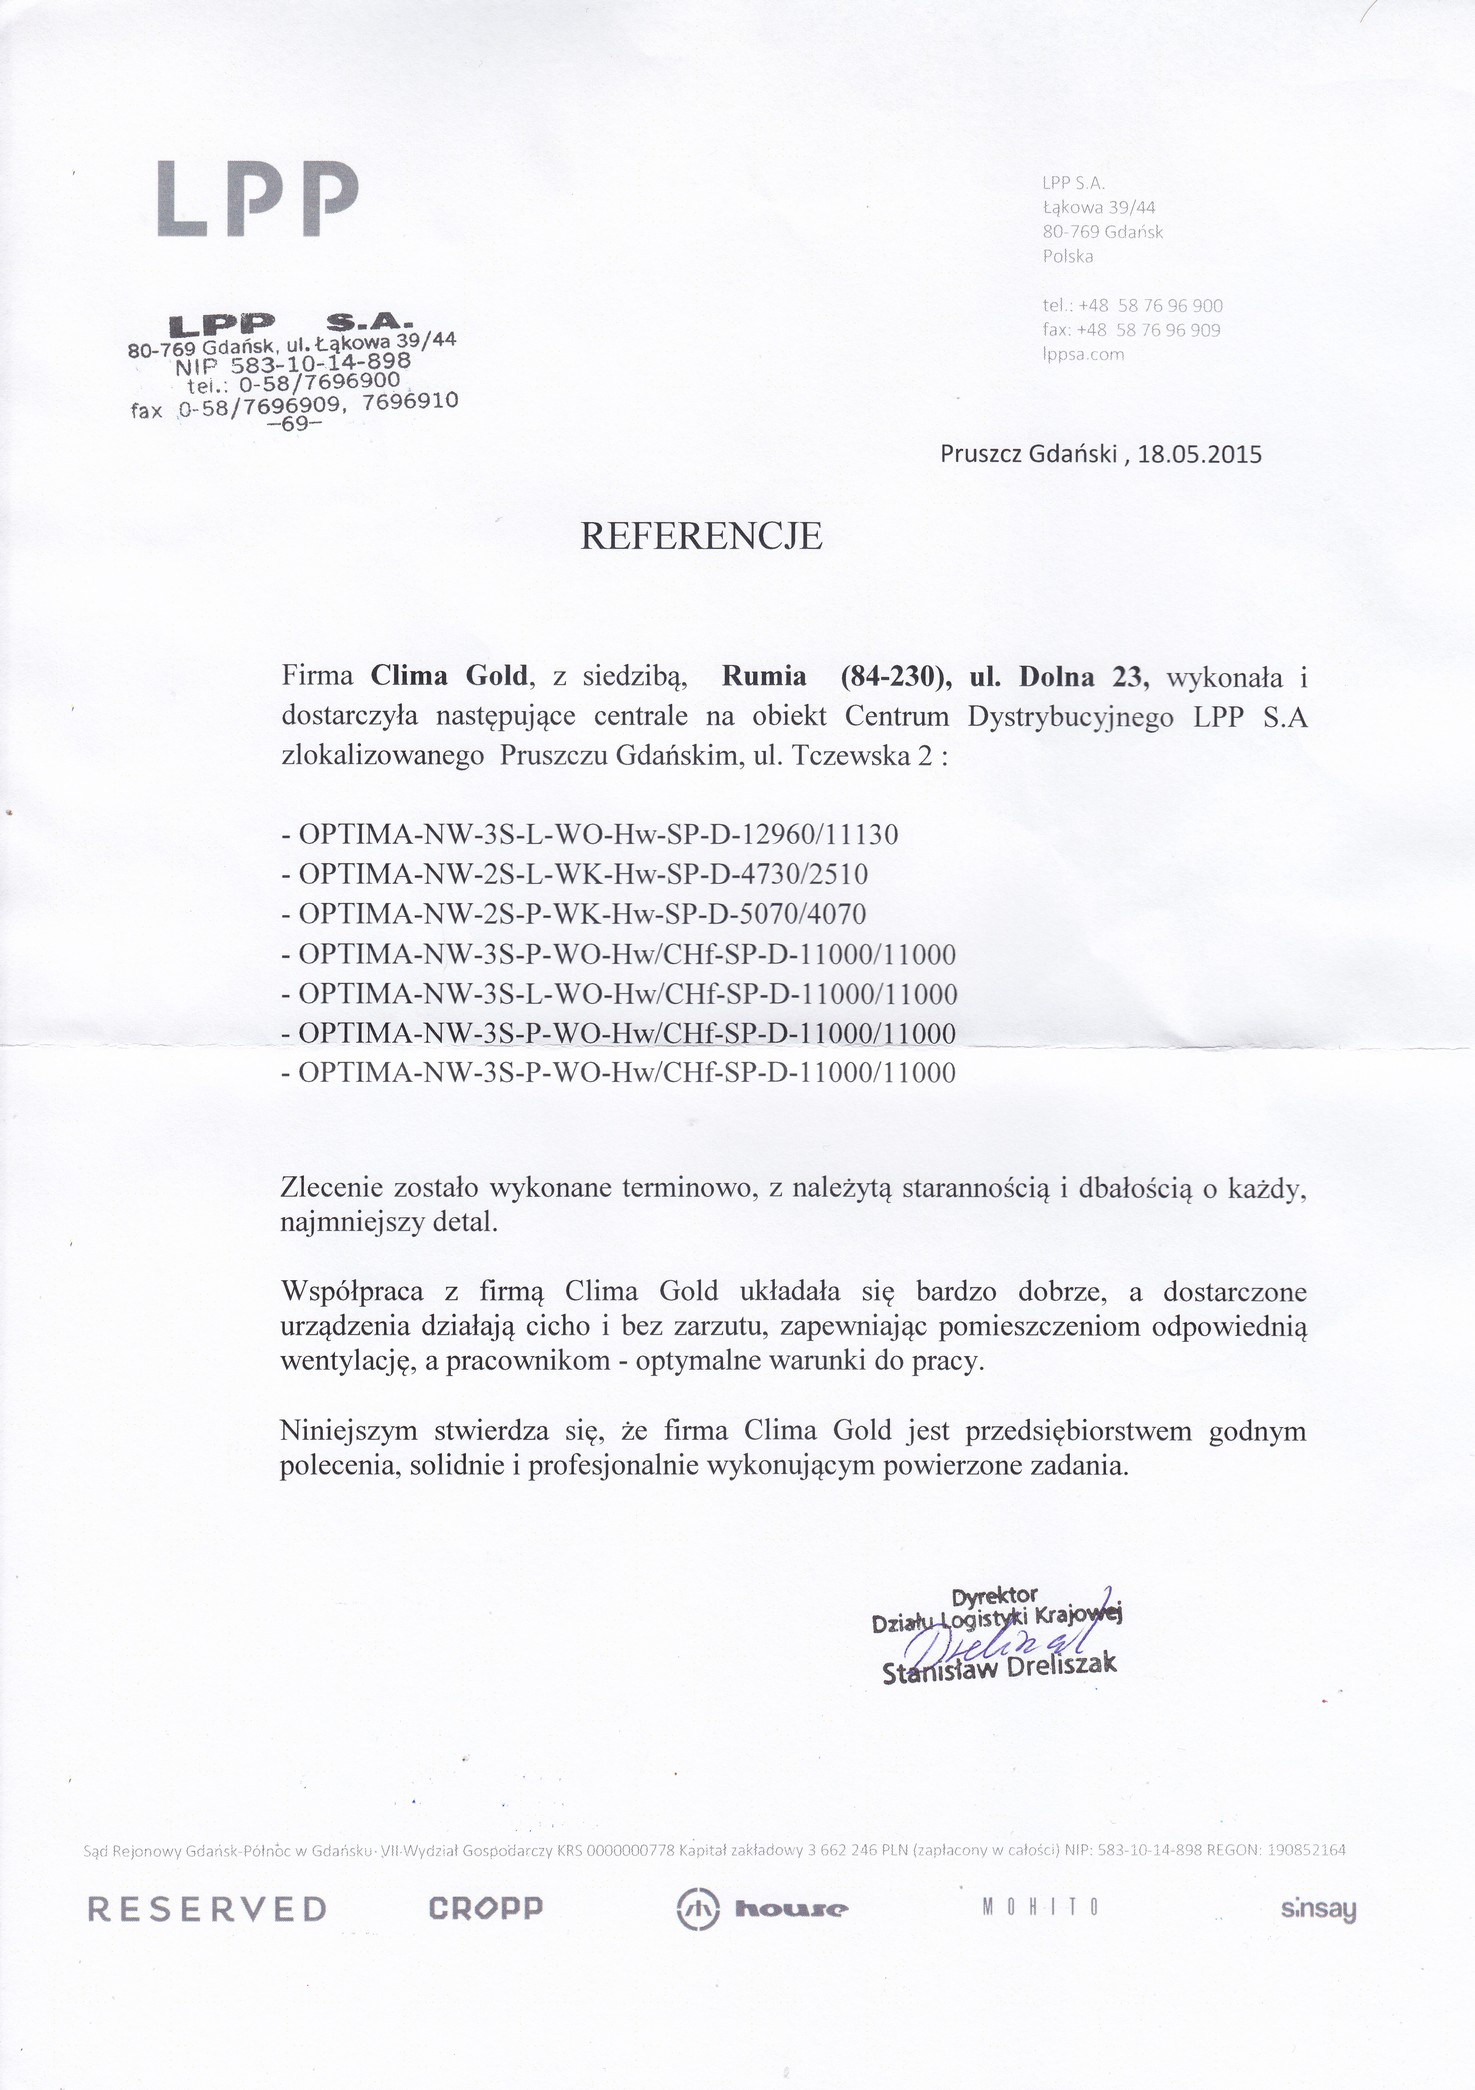 LPP referencje